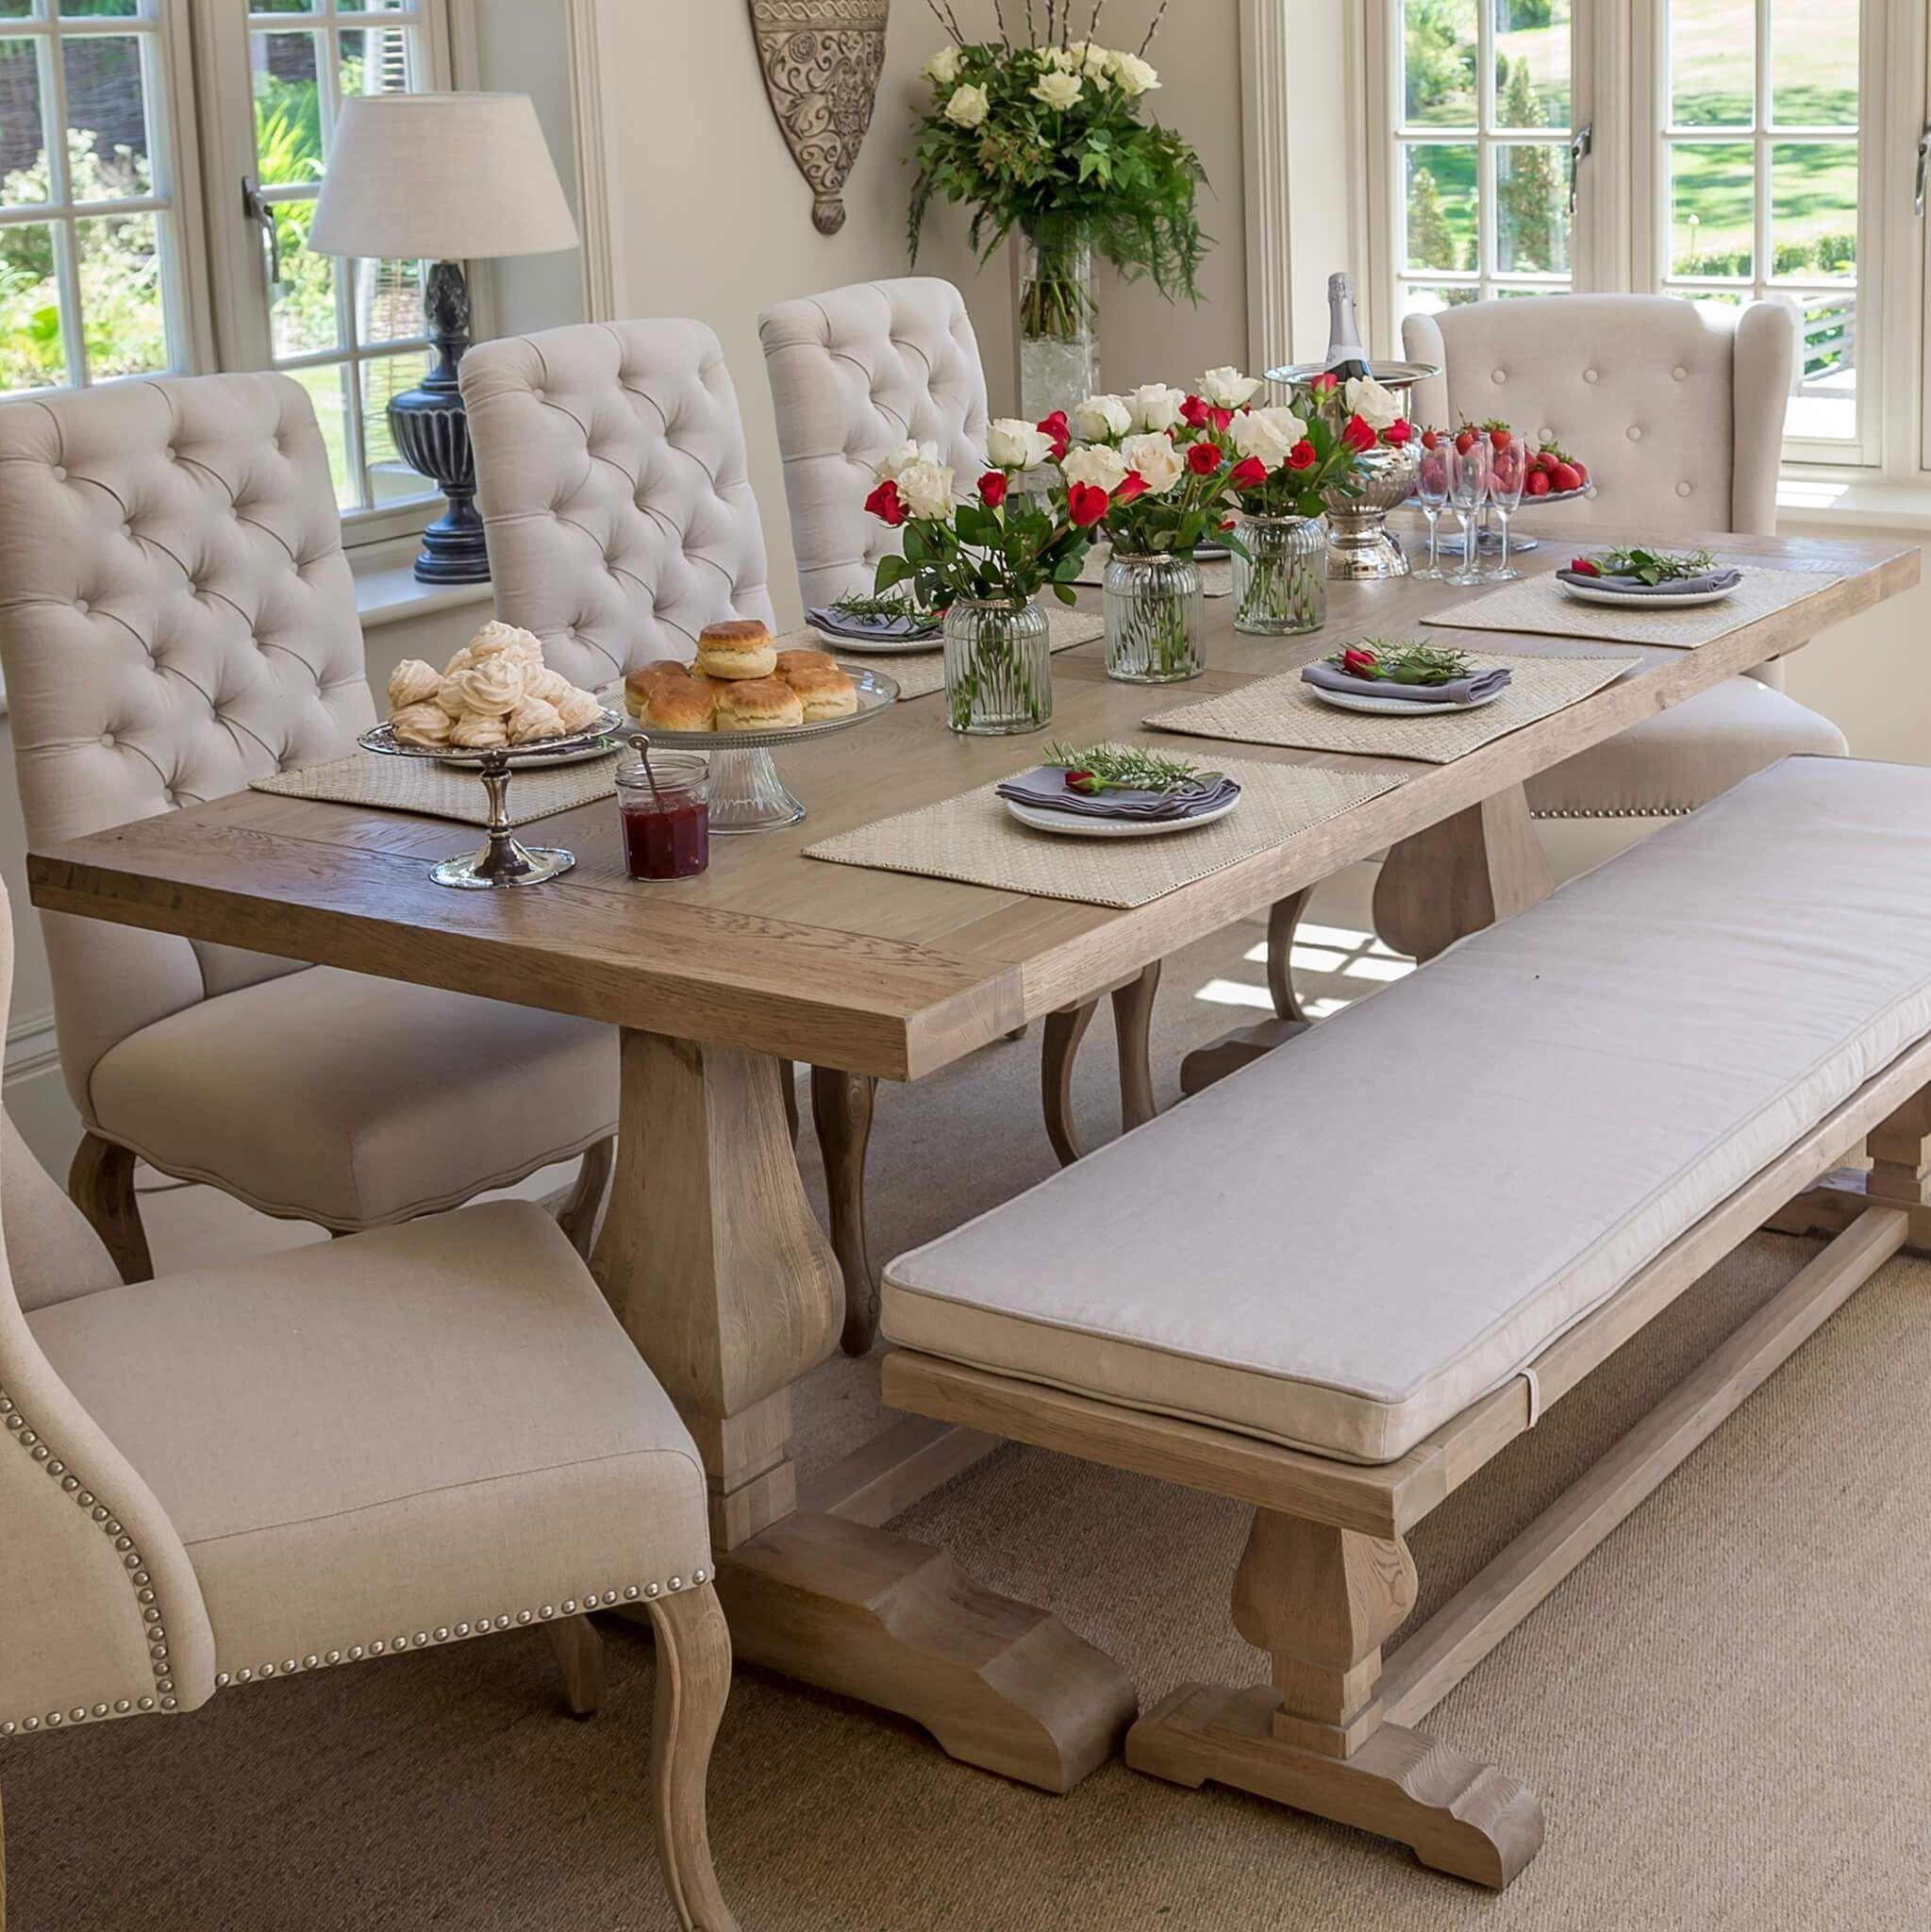 Amazon.com: dining room table - Fiberglass / Kitchen & Dining Room Furniture / Furniture: Home & Kitchen